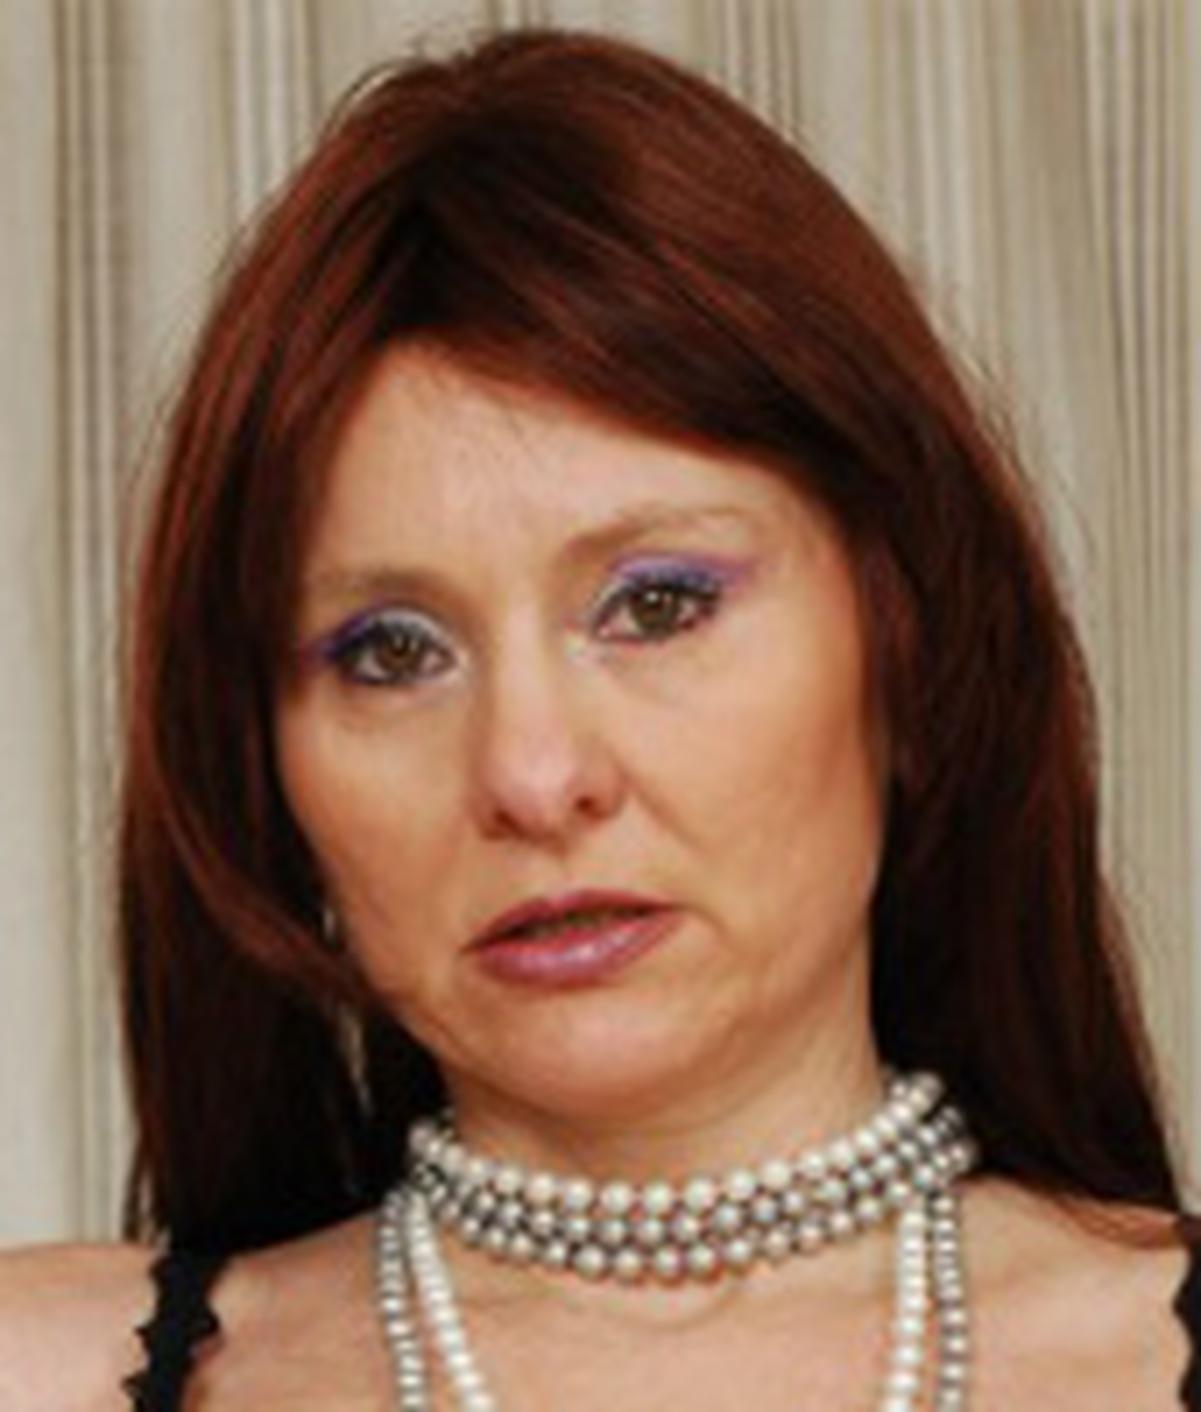 Soriana Canali